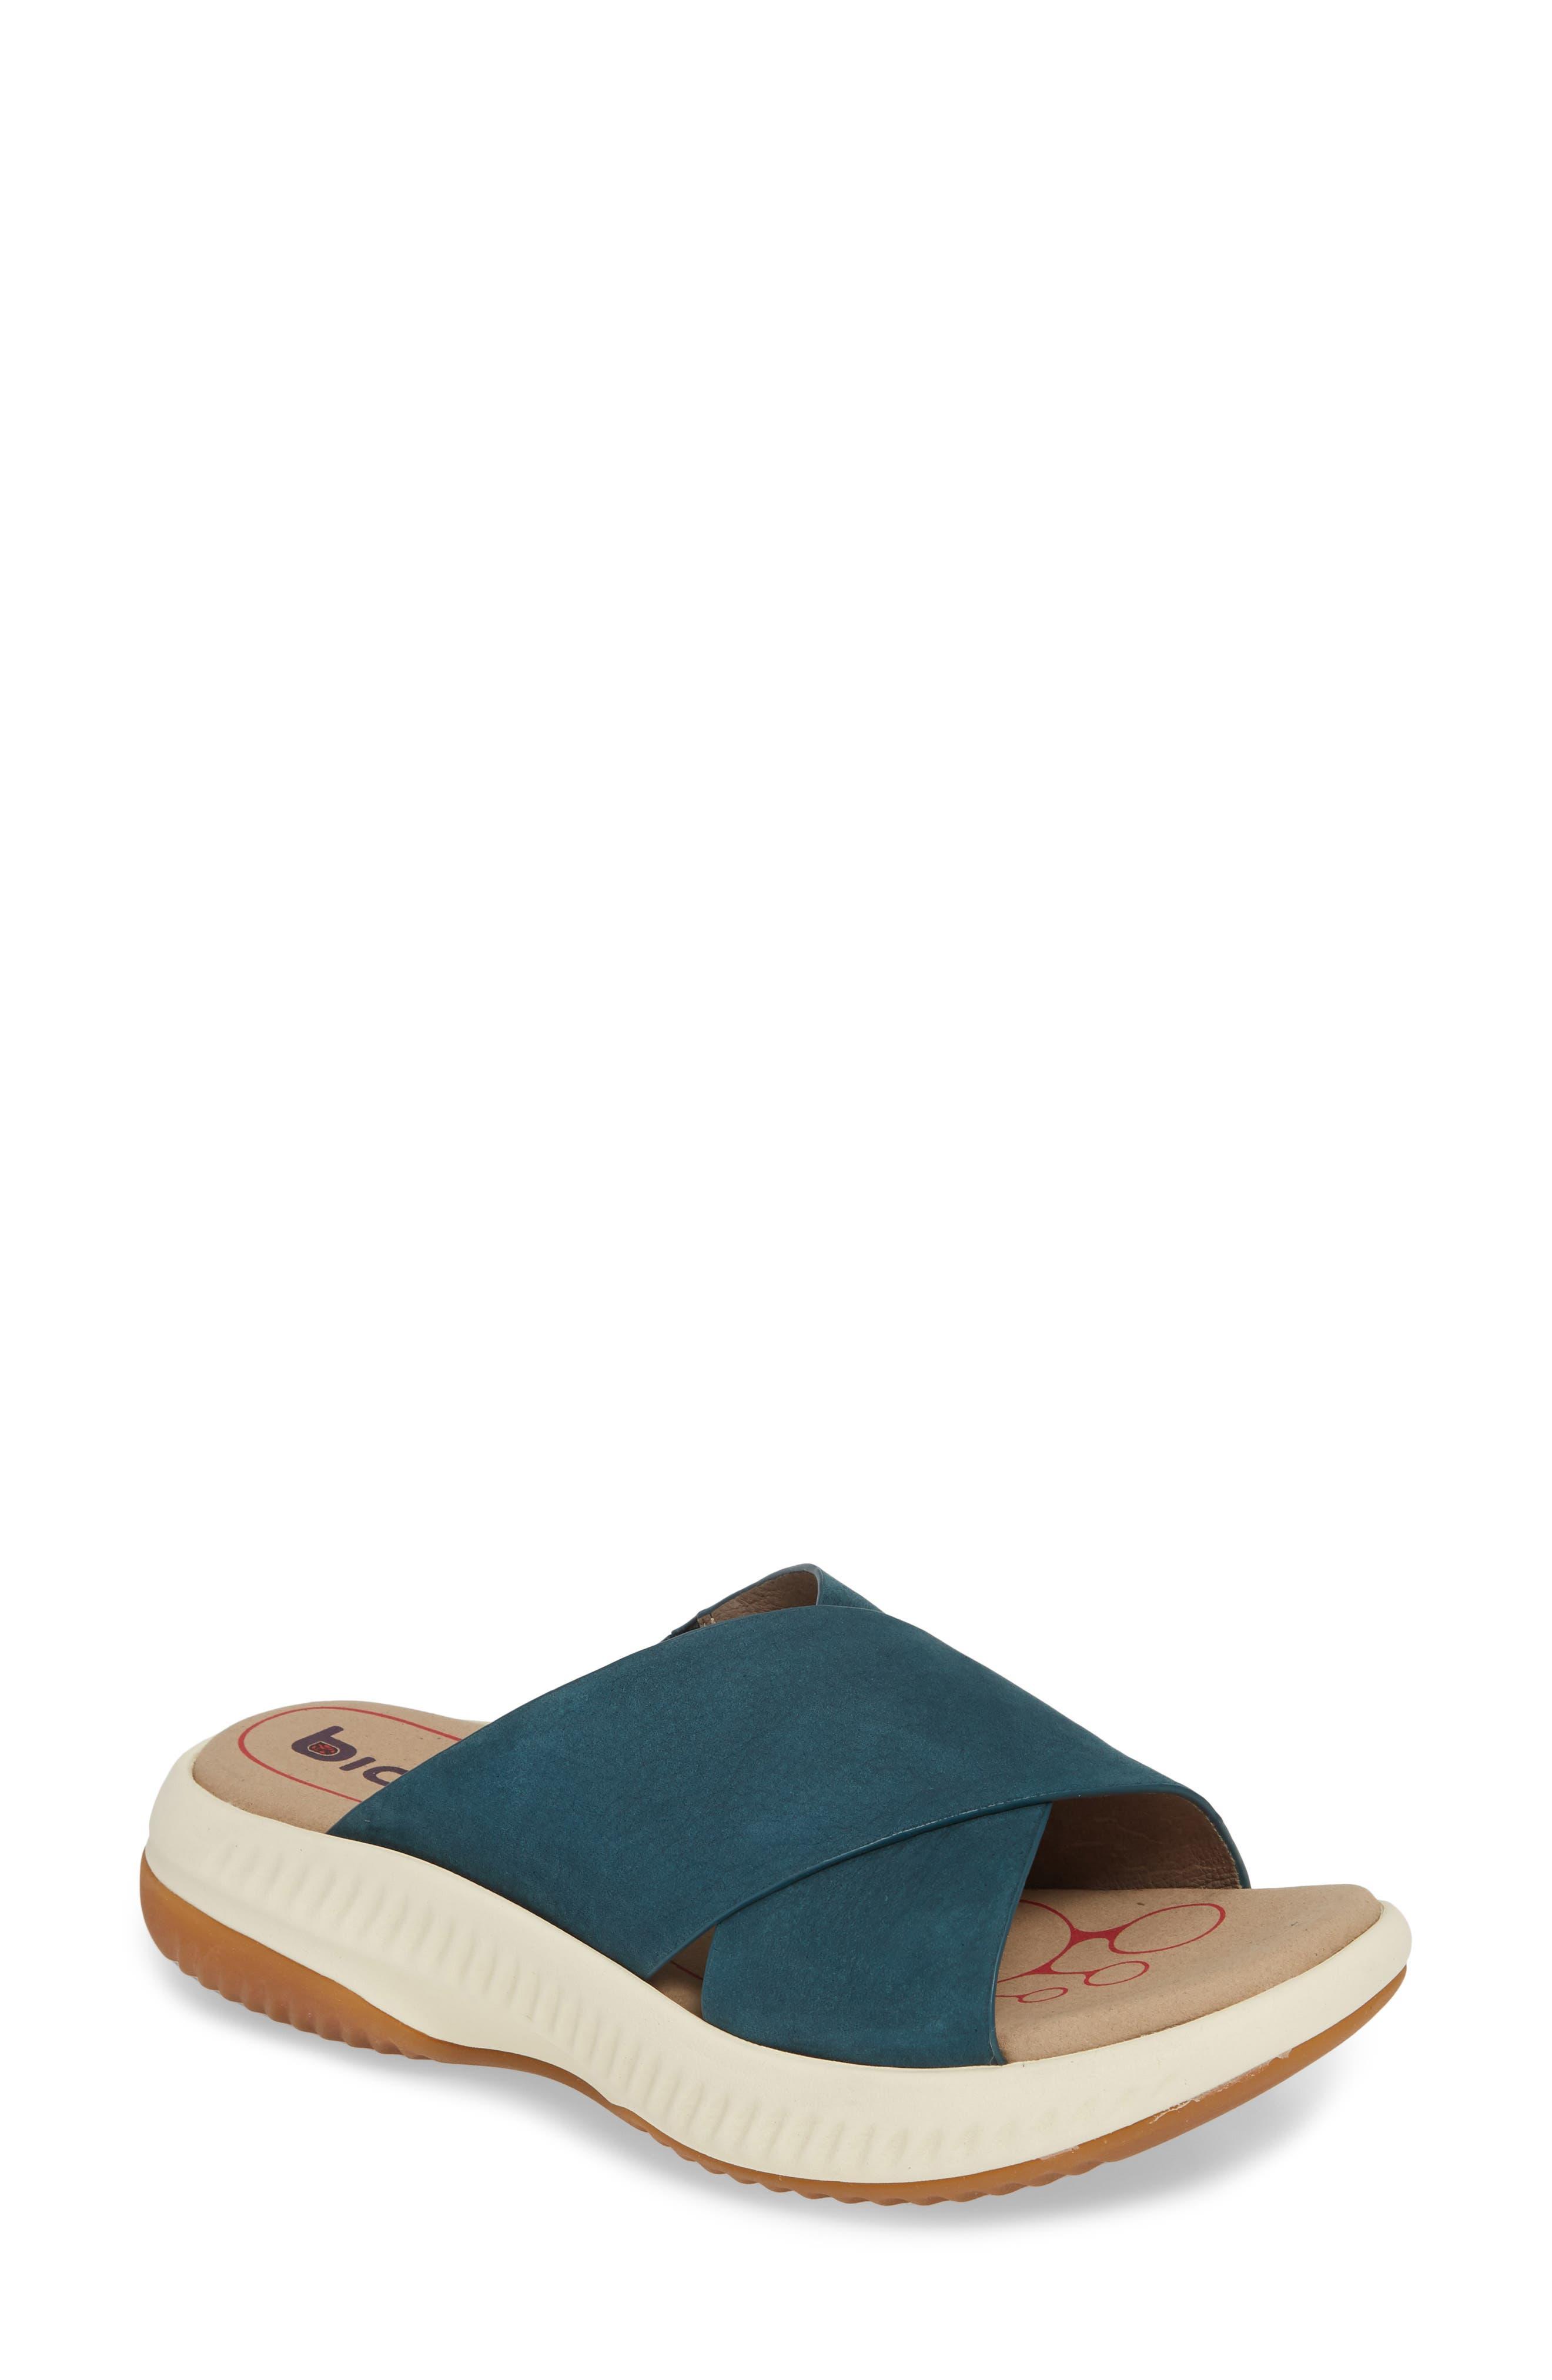 Bionica Ambridge Slide Sandal, Blue/green